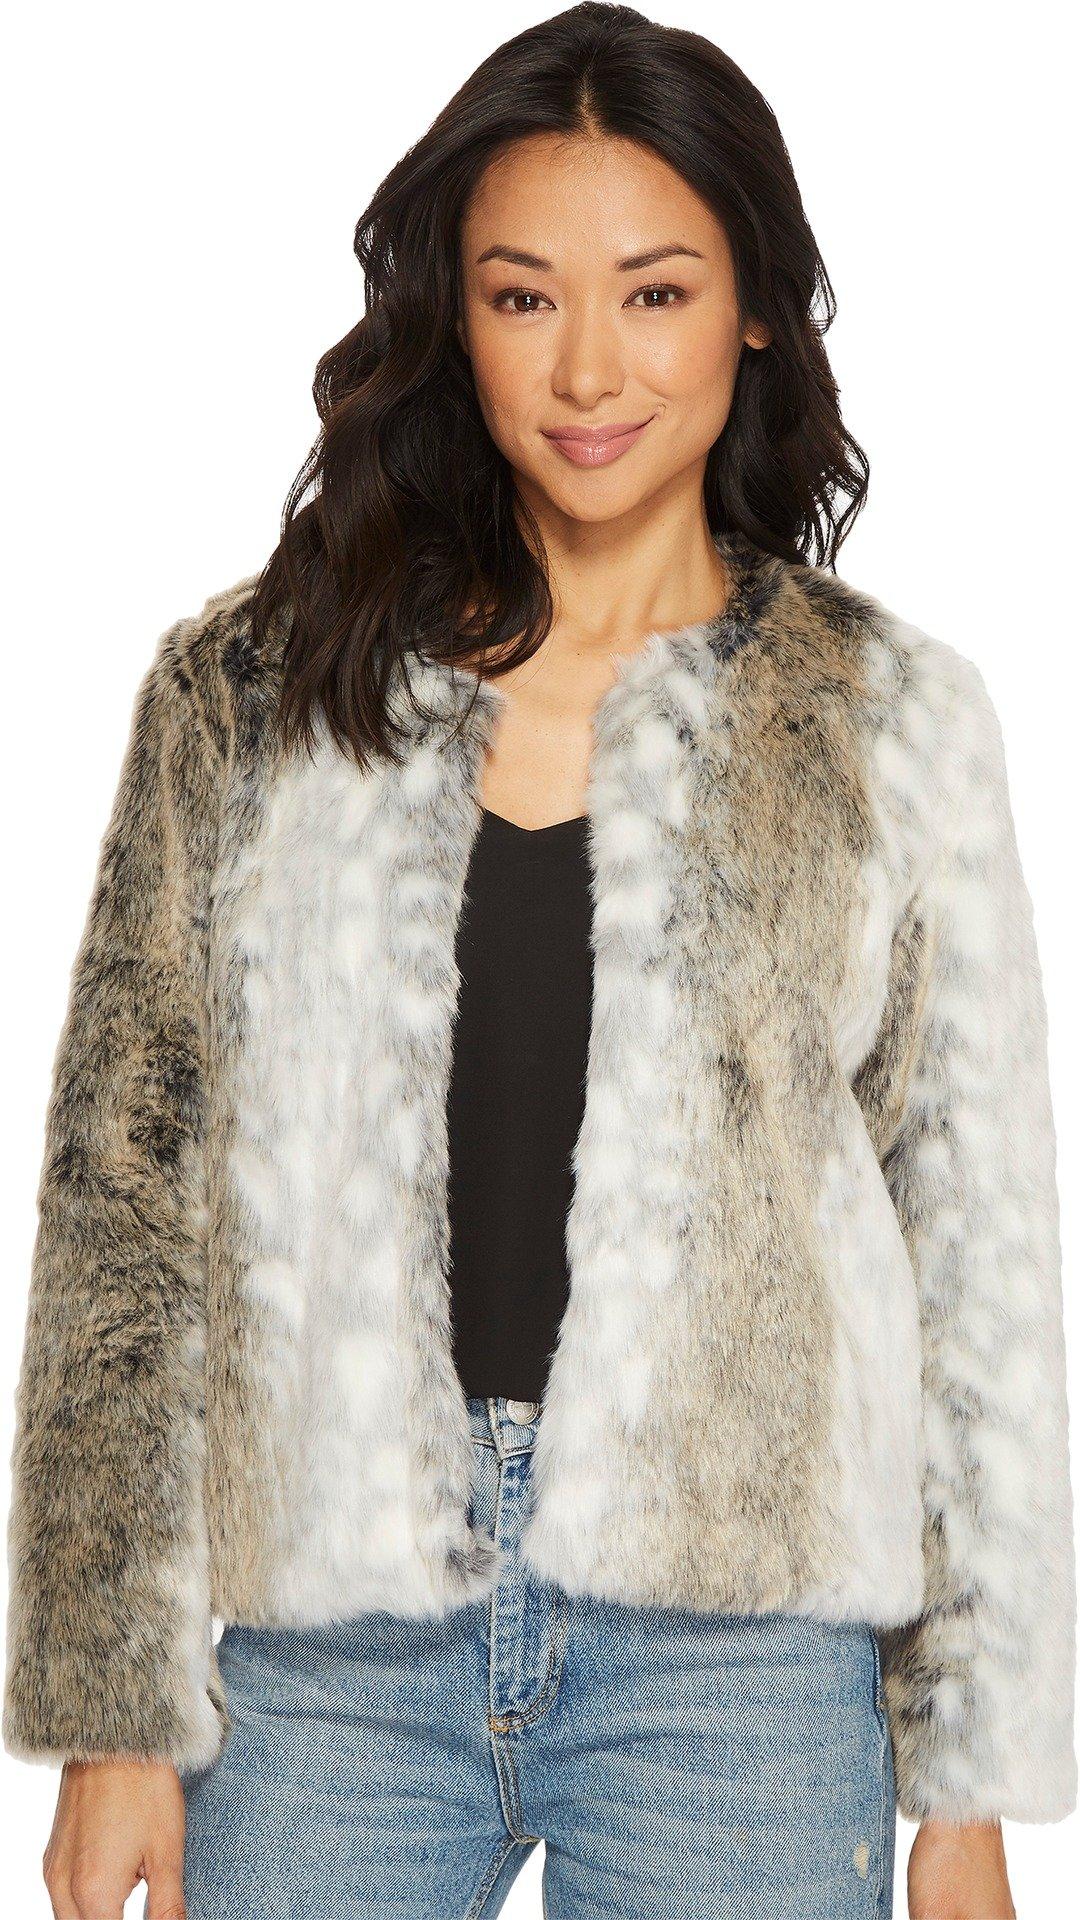 Tavik Women's Oliver Faux Fur Jacket White/Black Stripe Small